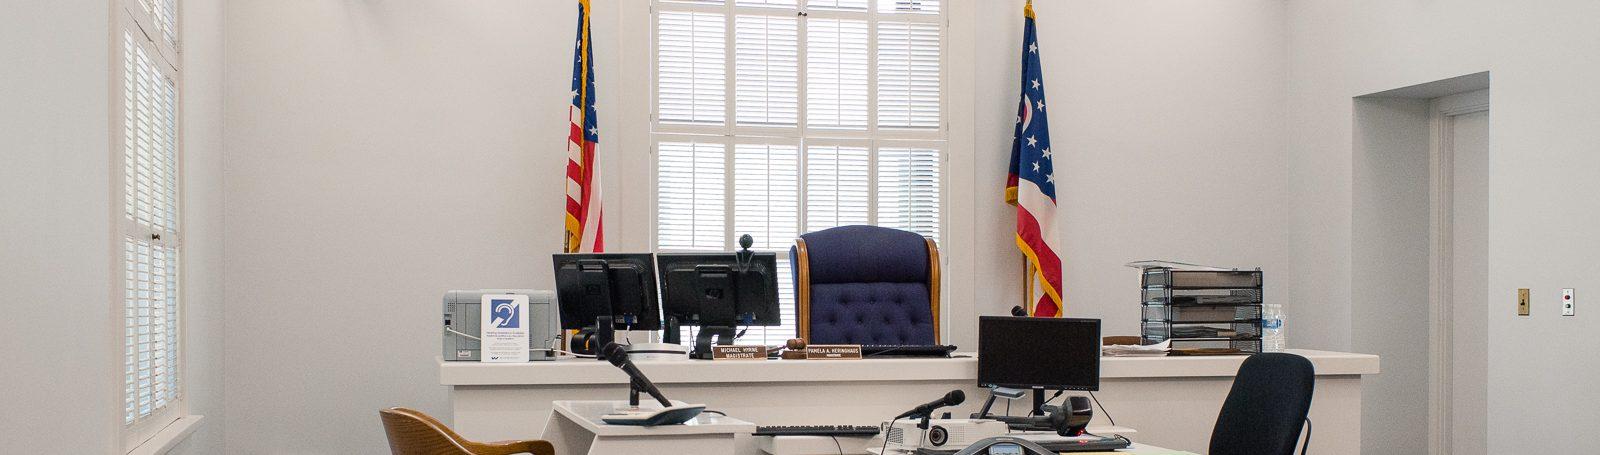 Judges chambers